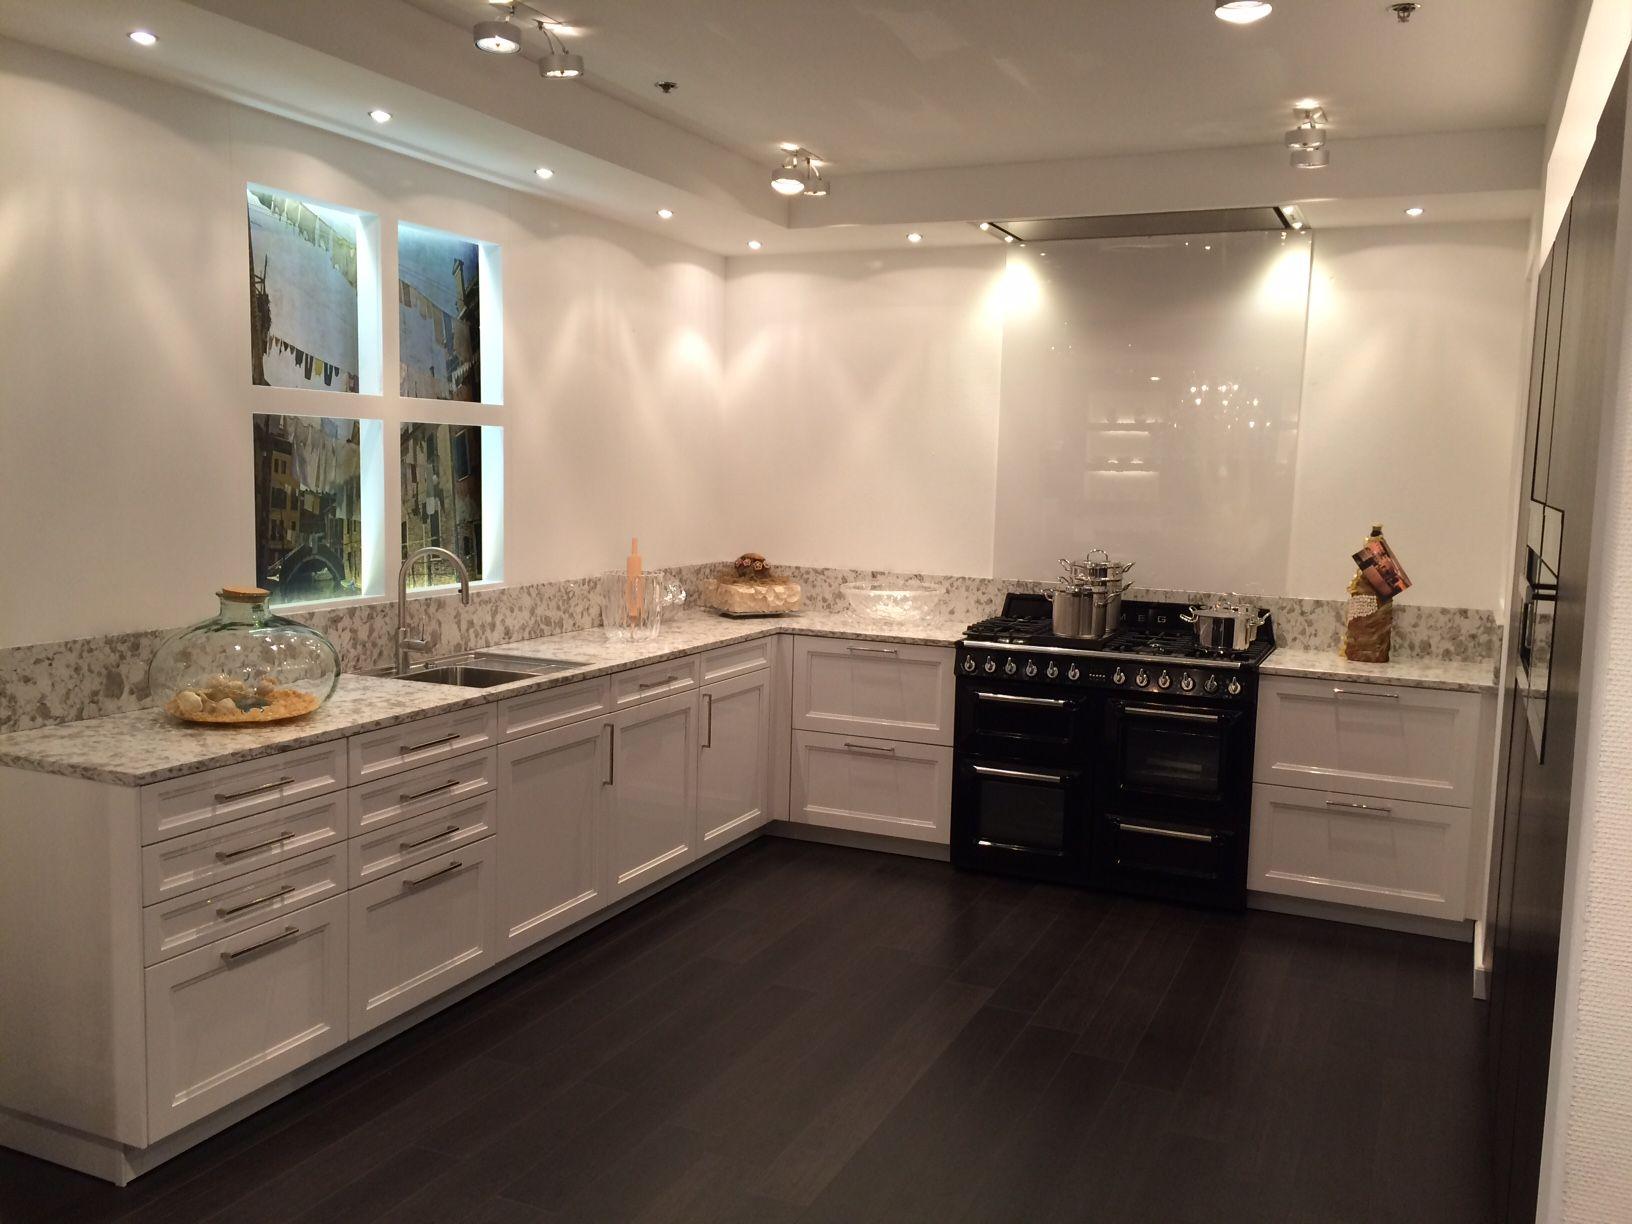 allergrootste keukensite van nederland siematic classic beauxarts 39383. Black Bedroom Furniture Sets. Home Design Ideas